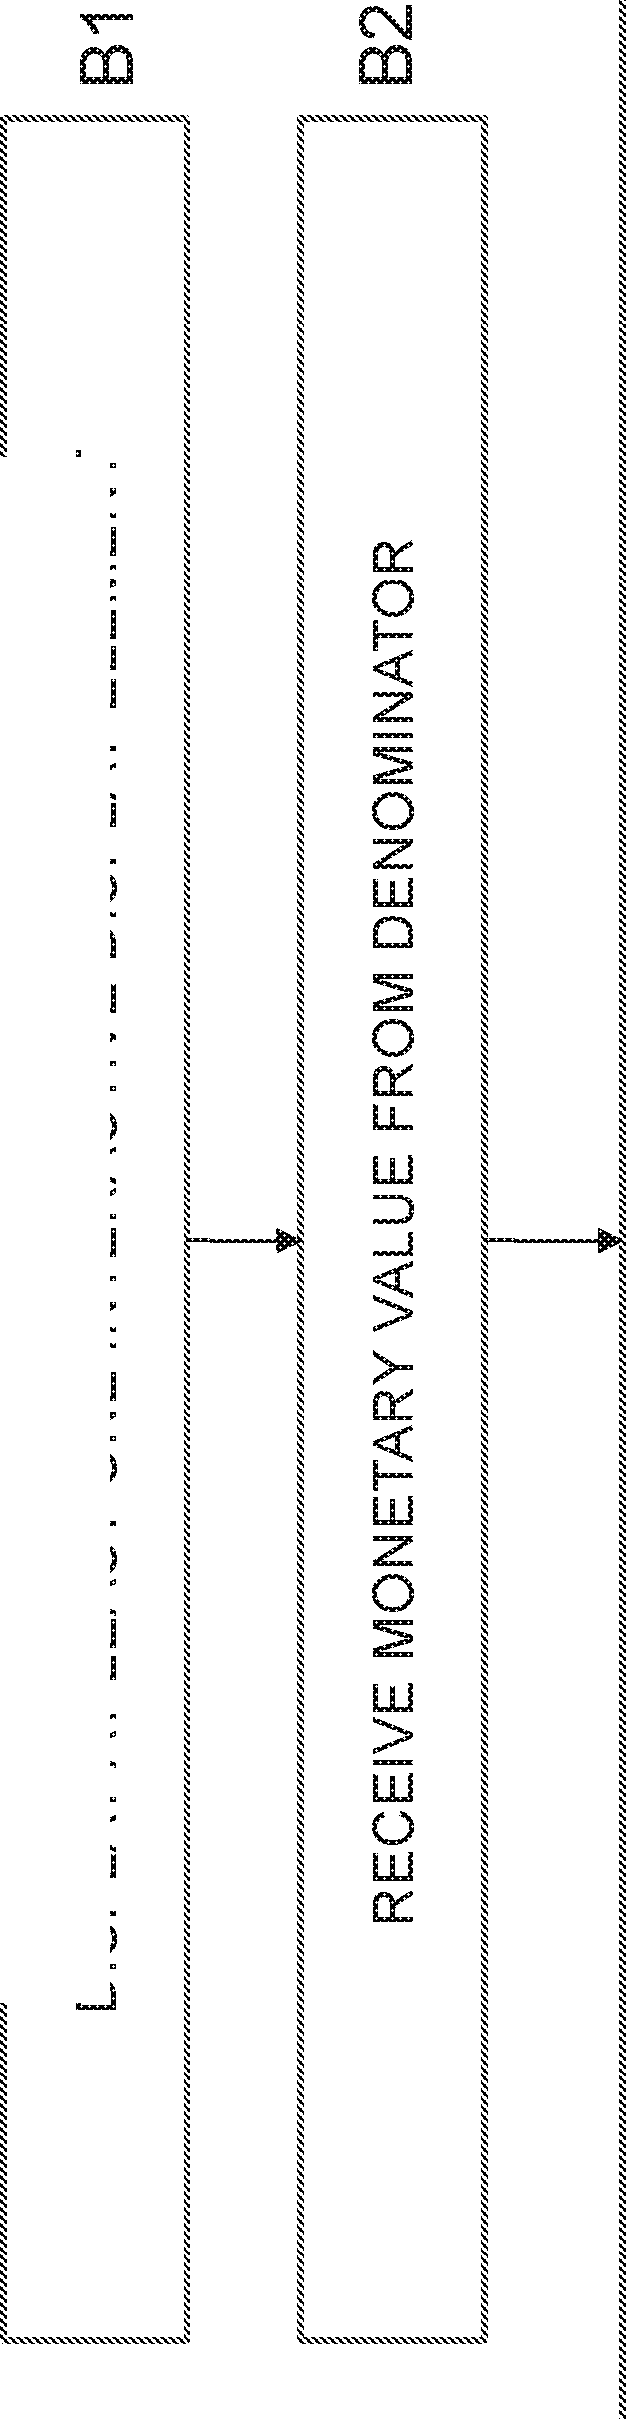 Figure GB2557237A_D0009